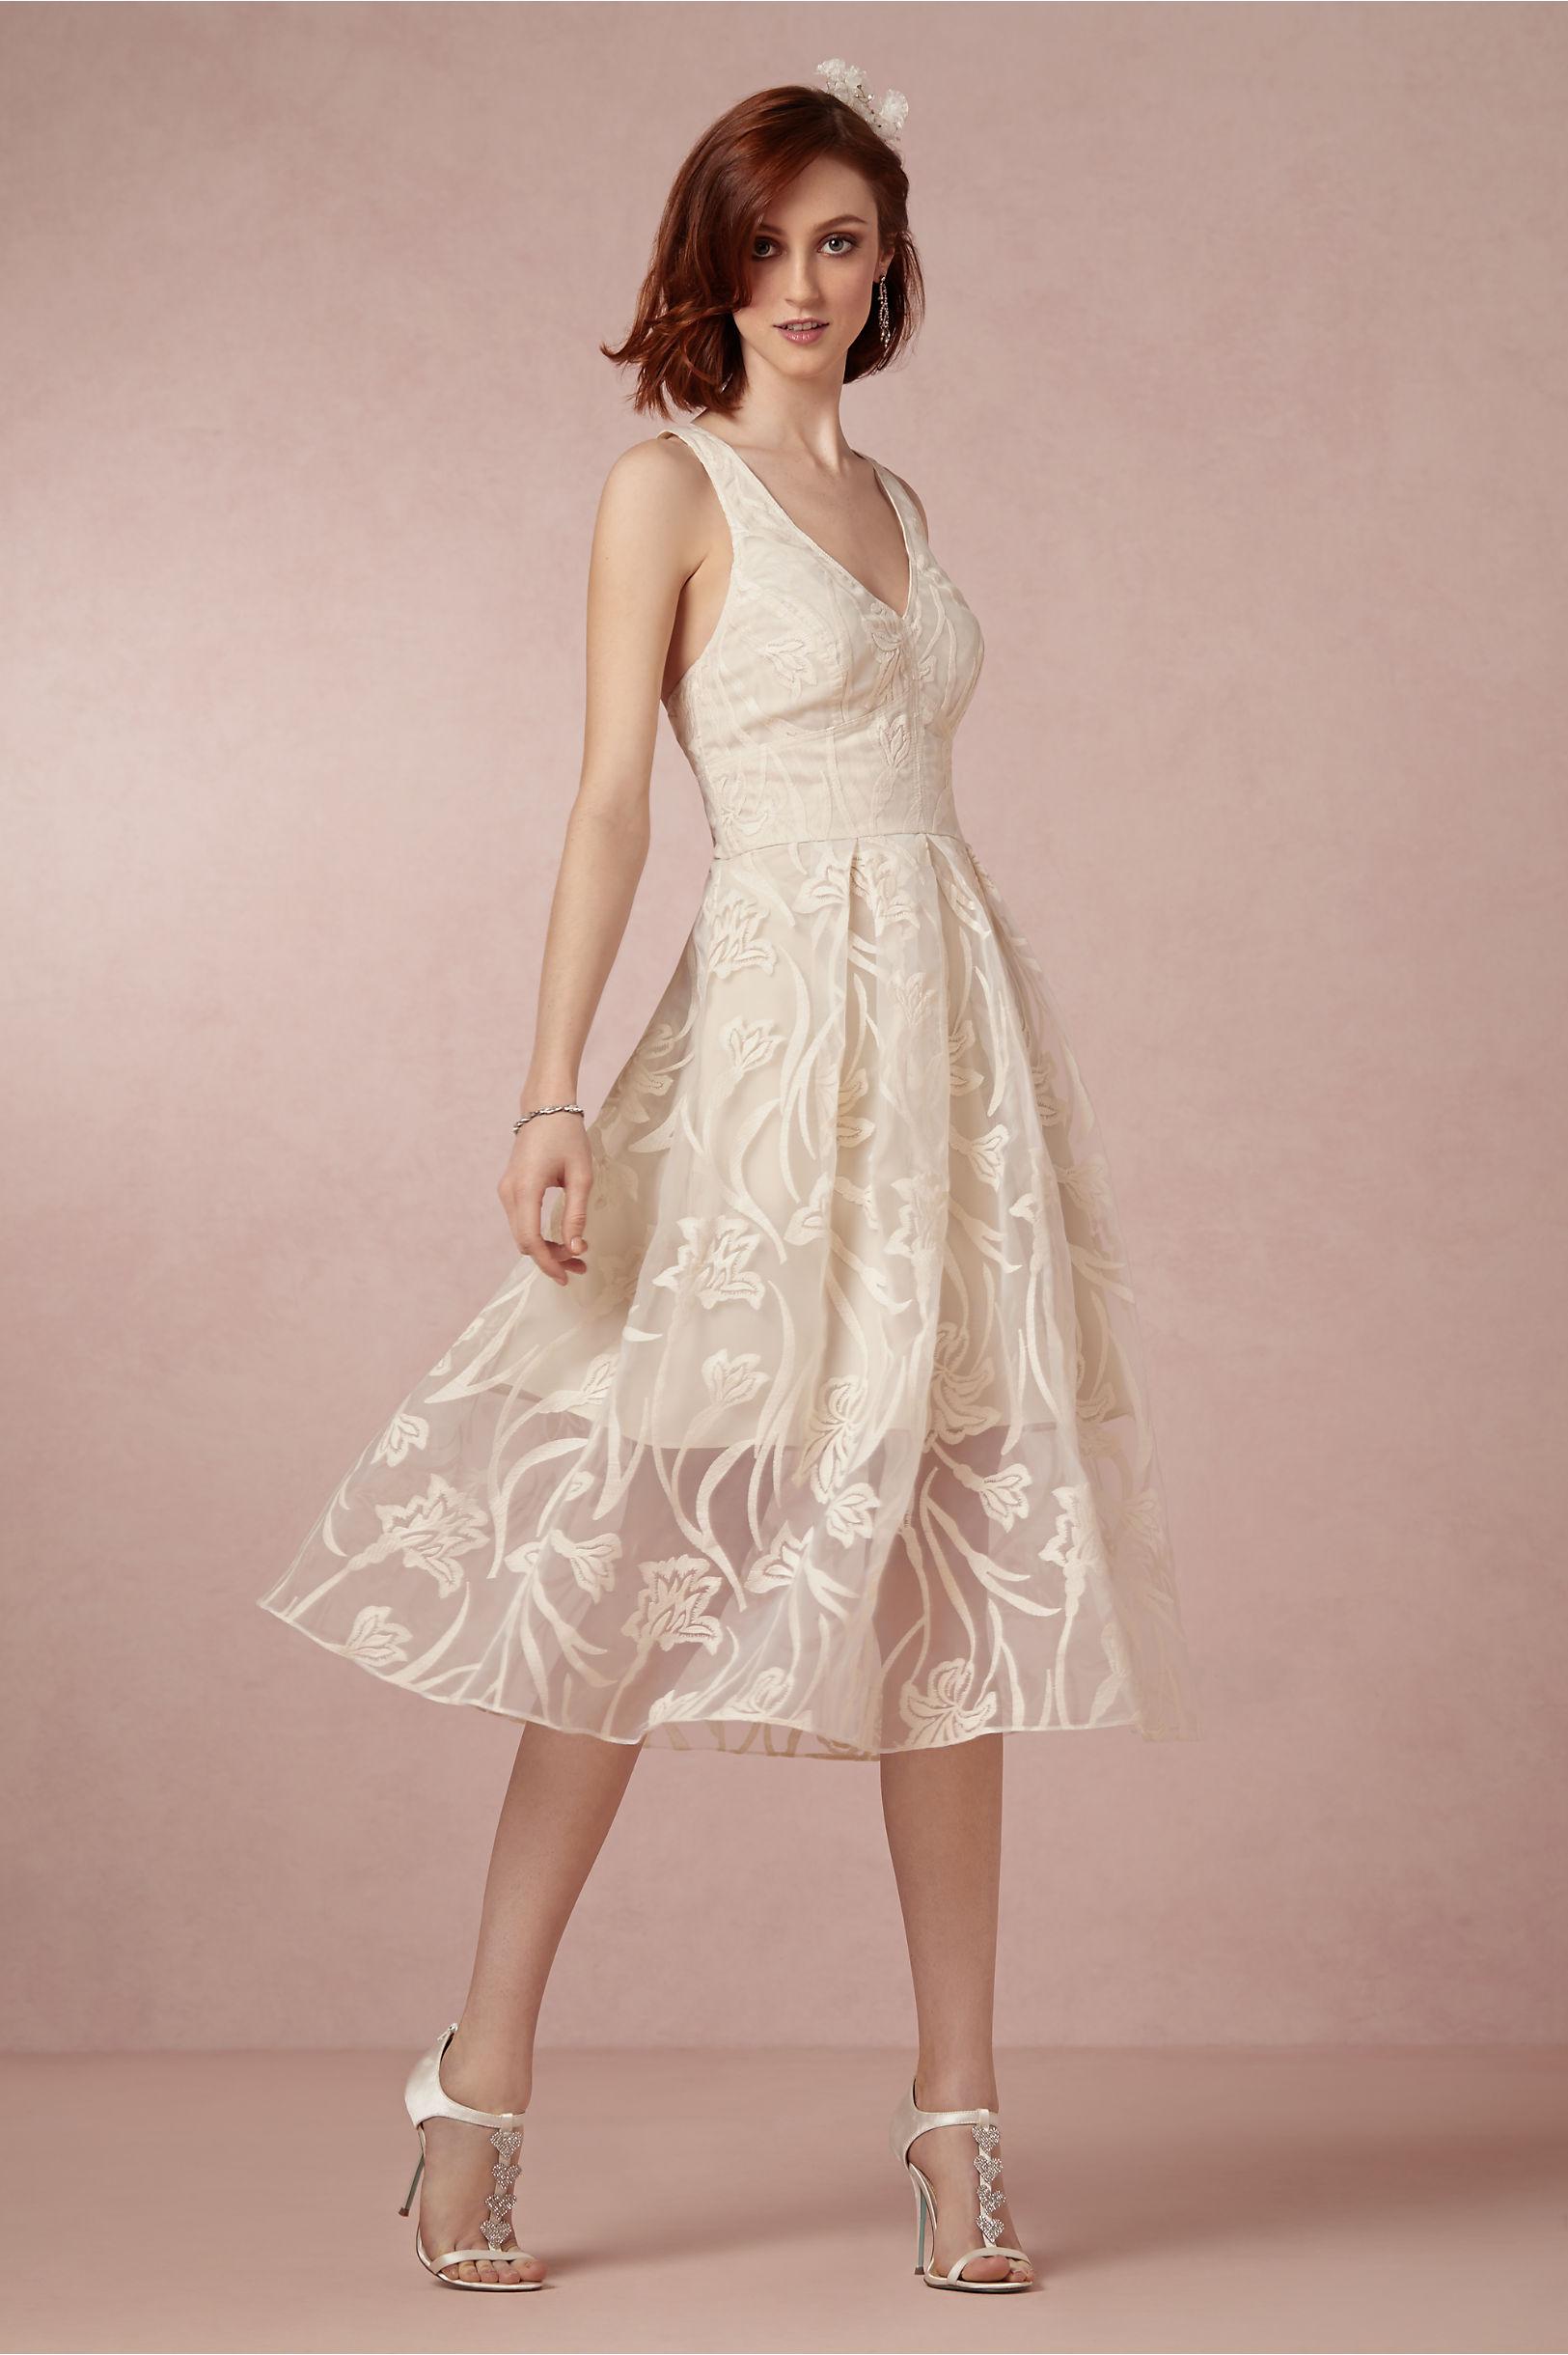 Fresh Blossoms Dress in Sale | BHLDN